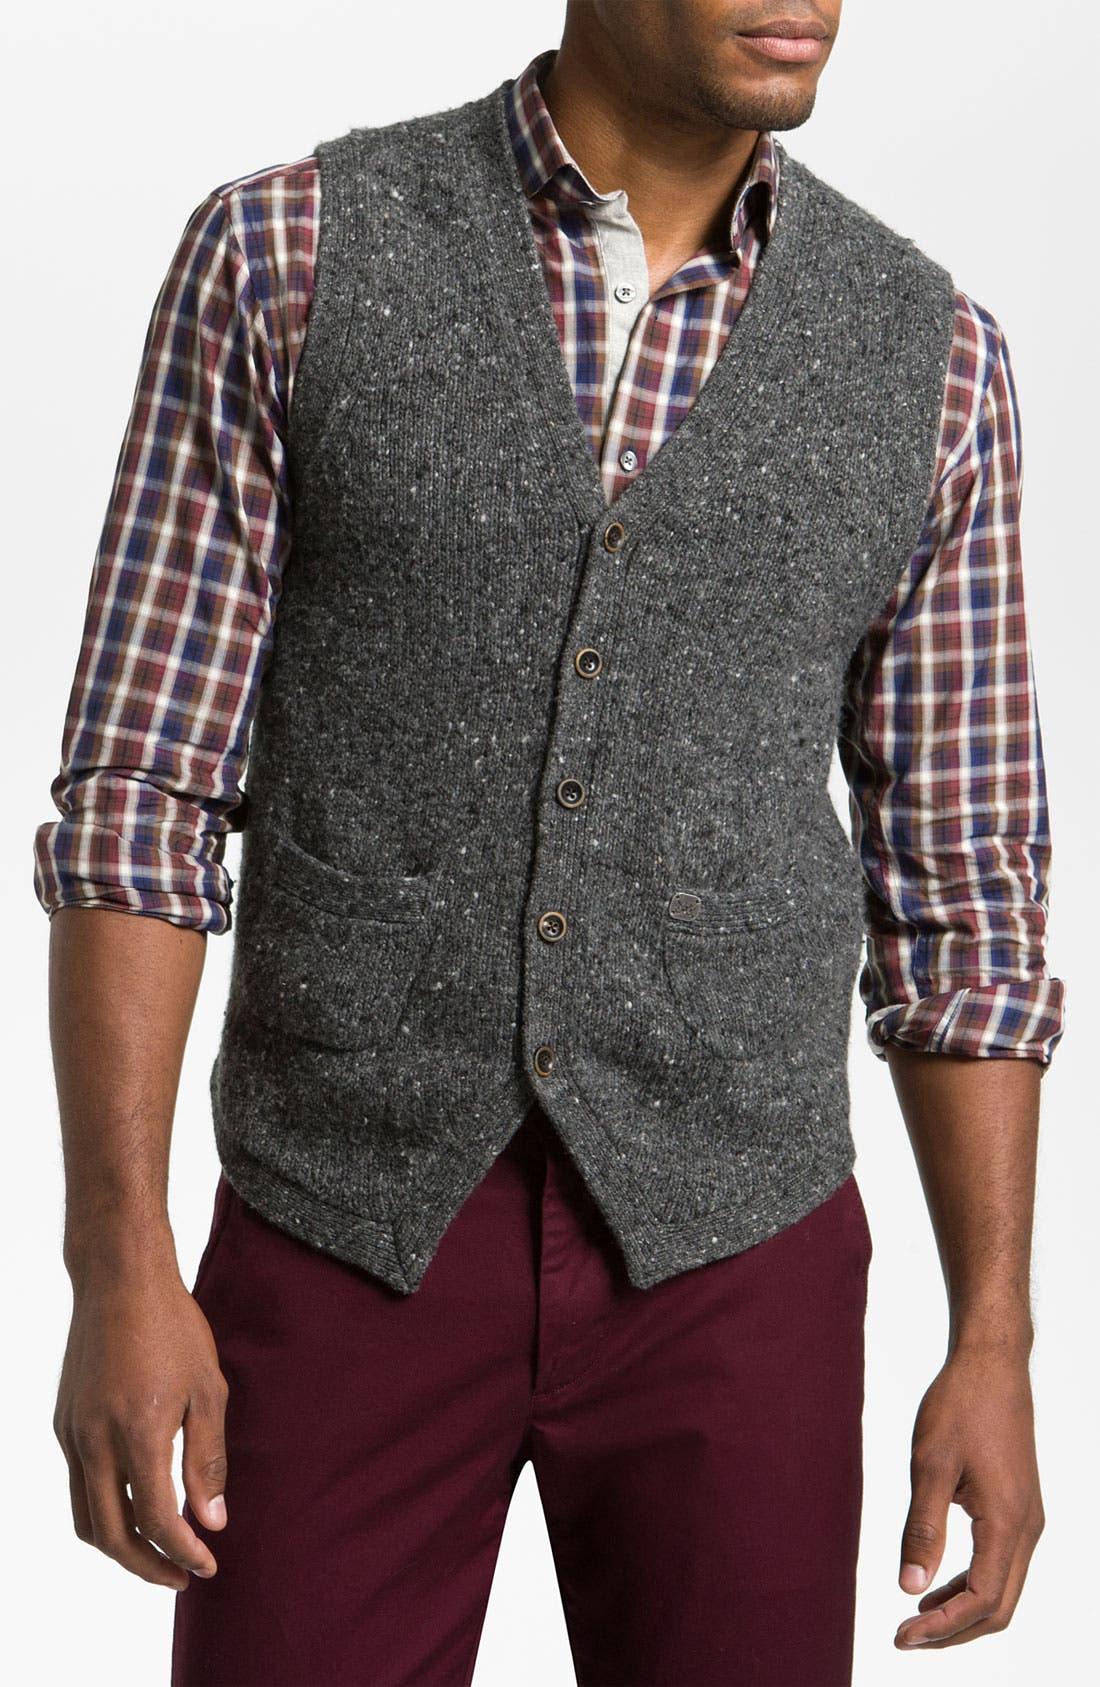 Main Image - Hickey Freeman 'Donegal' Merino Blend Sweater Vest